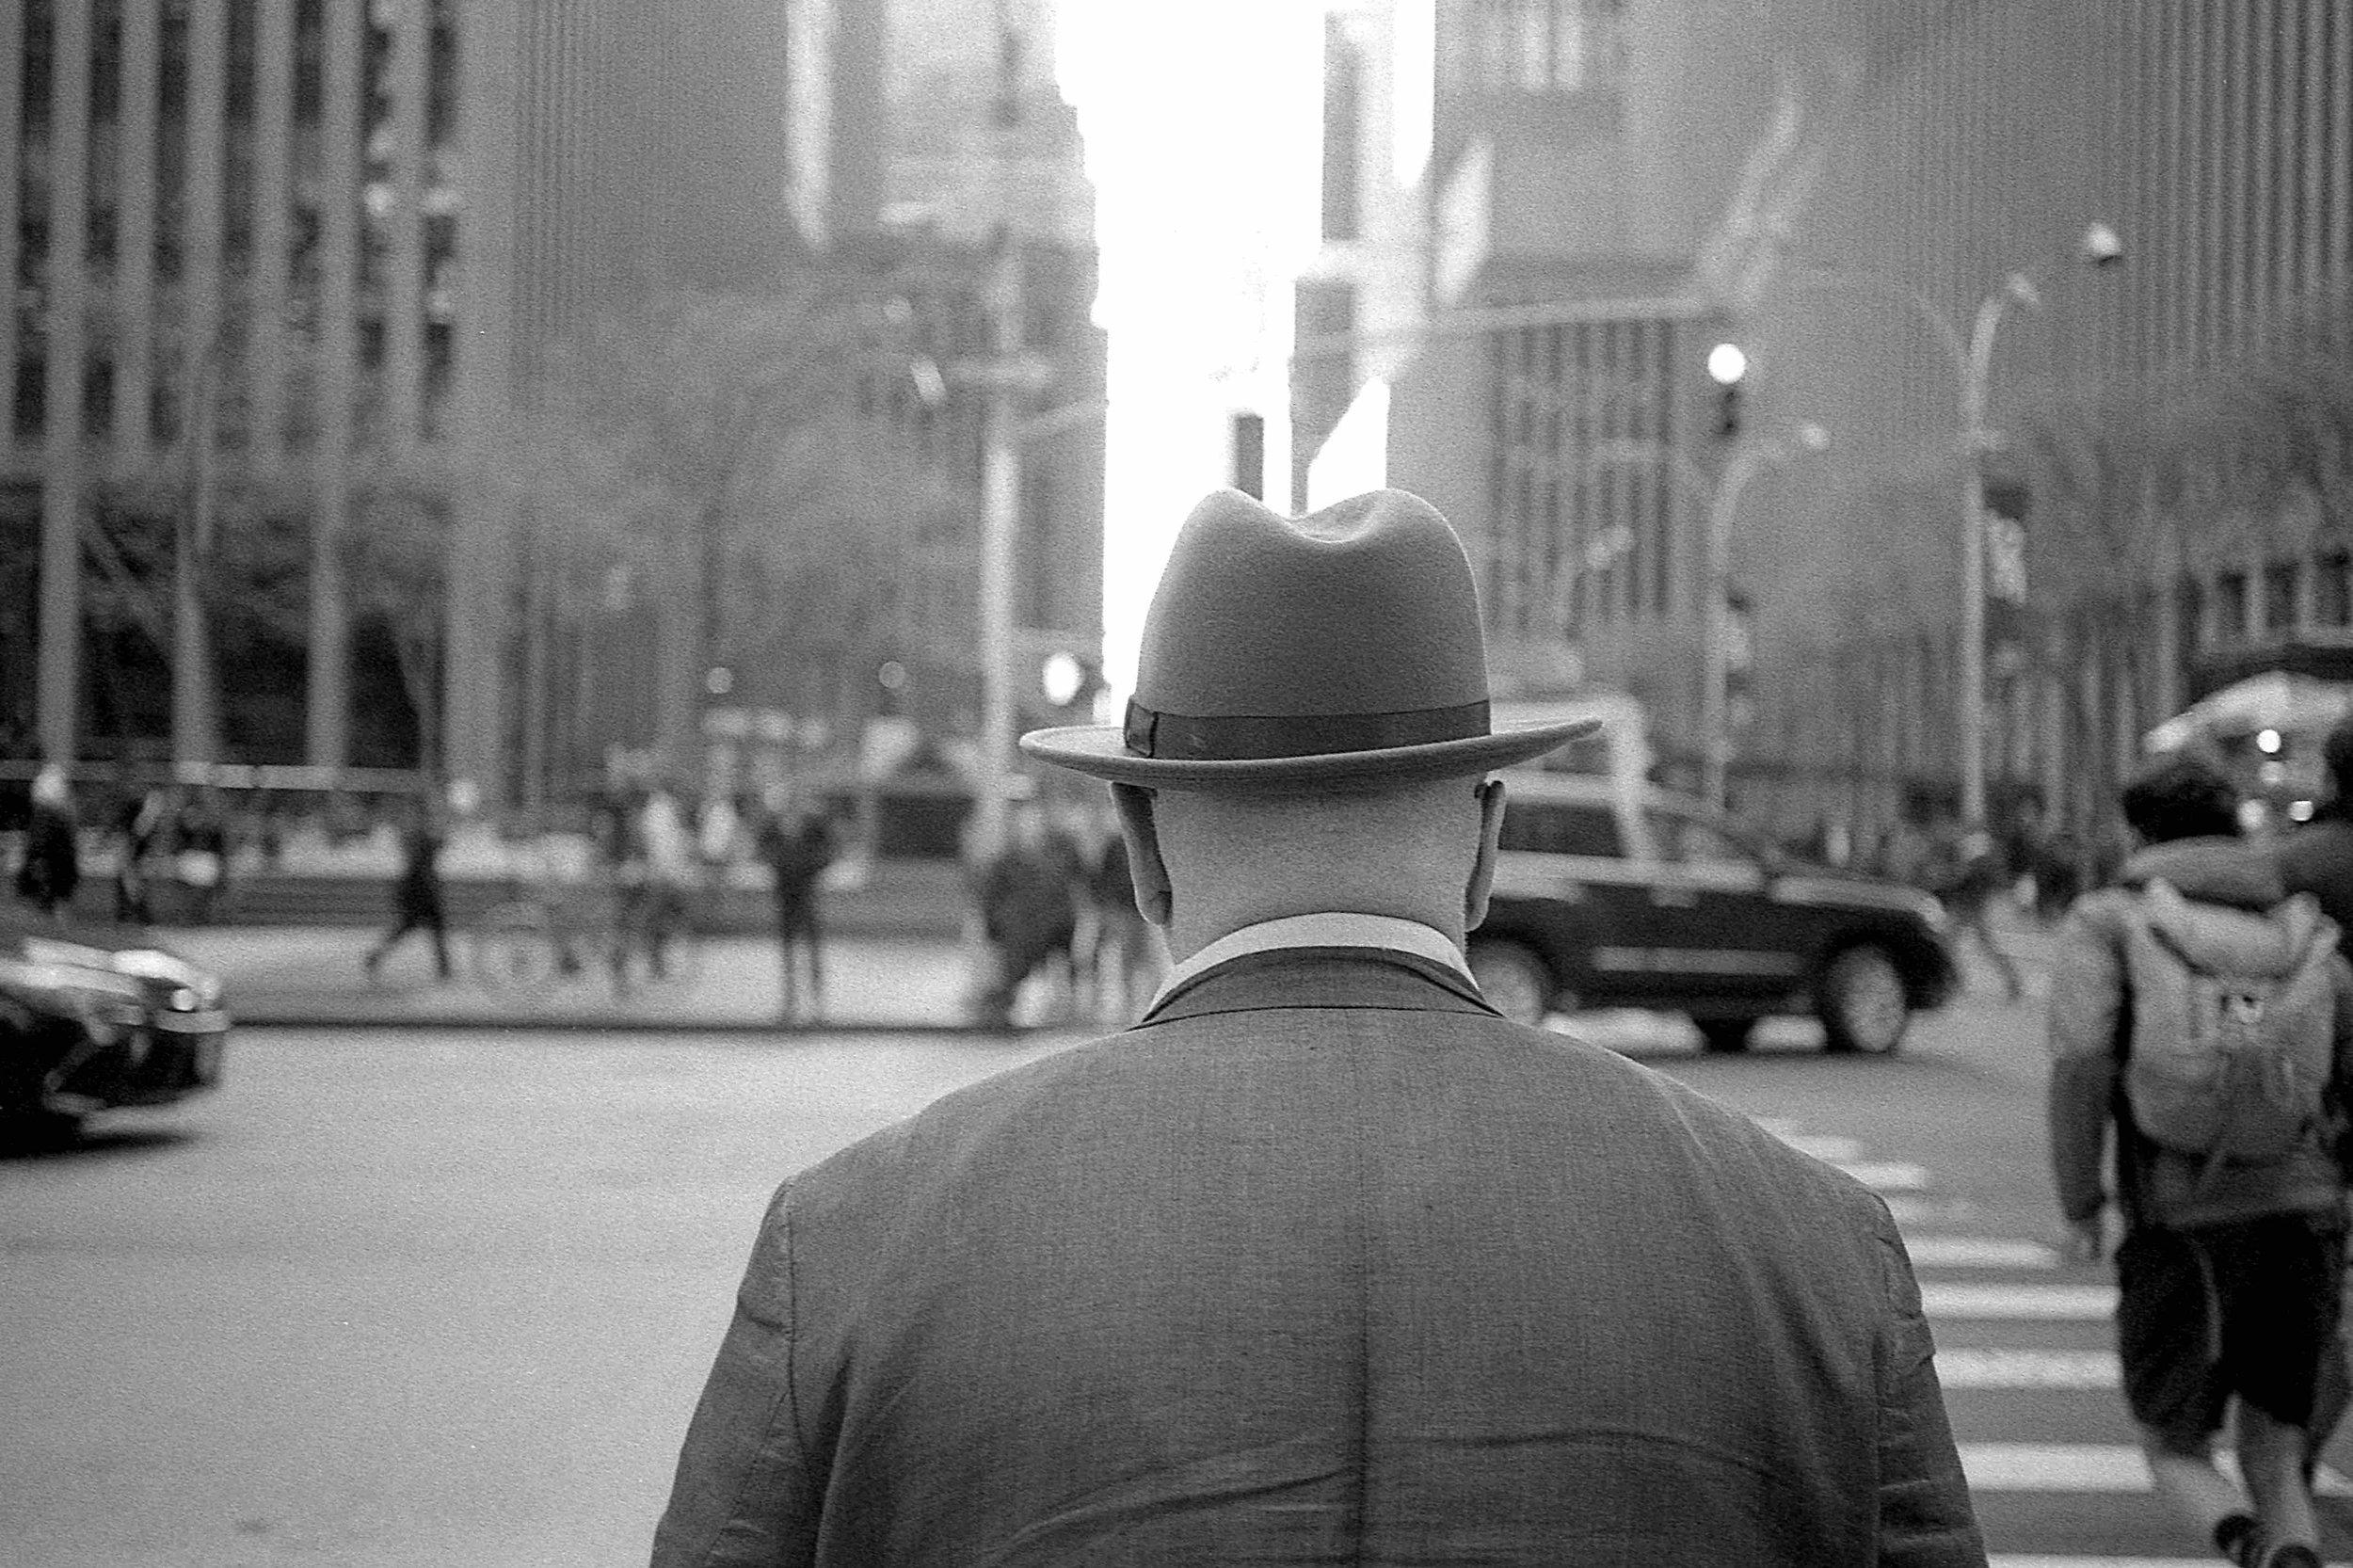 Matt Pittman / Leica M7 / Ilford HP5 / New York City